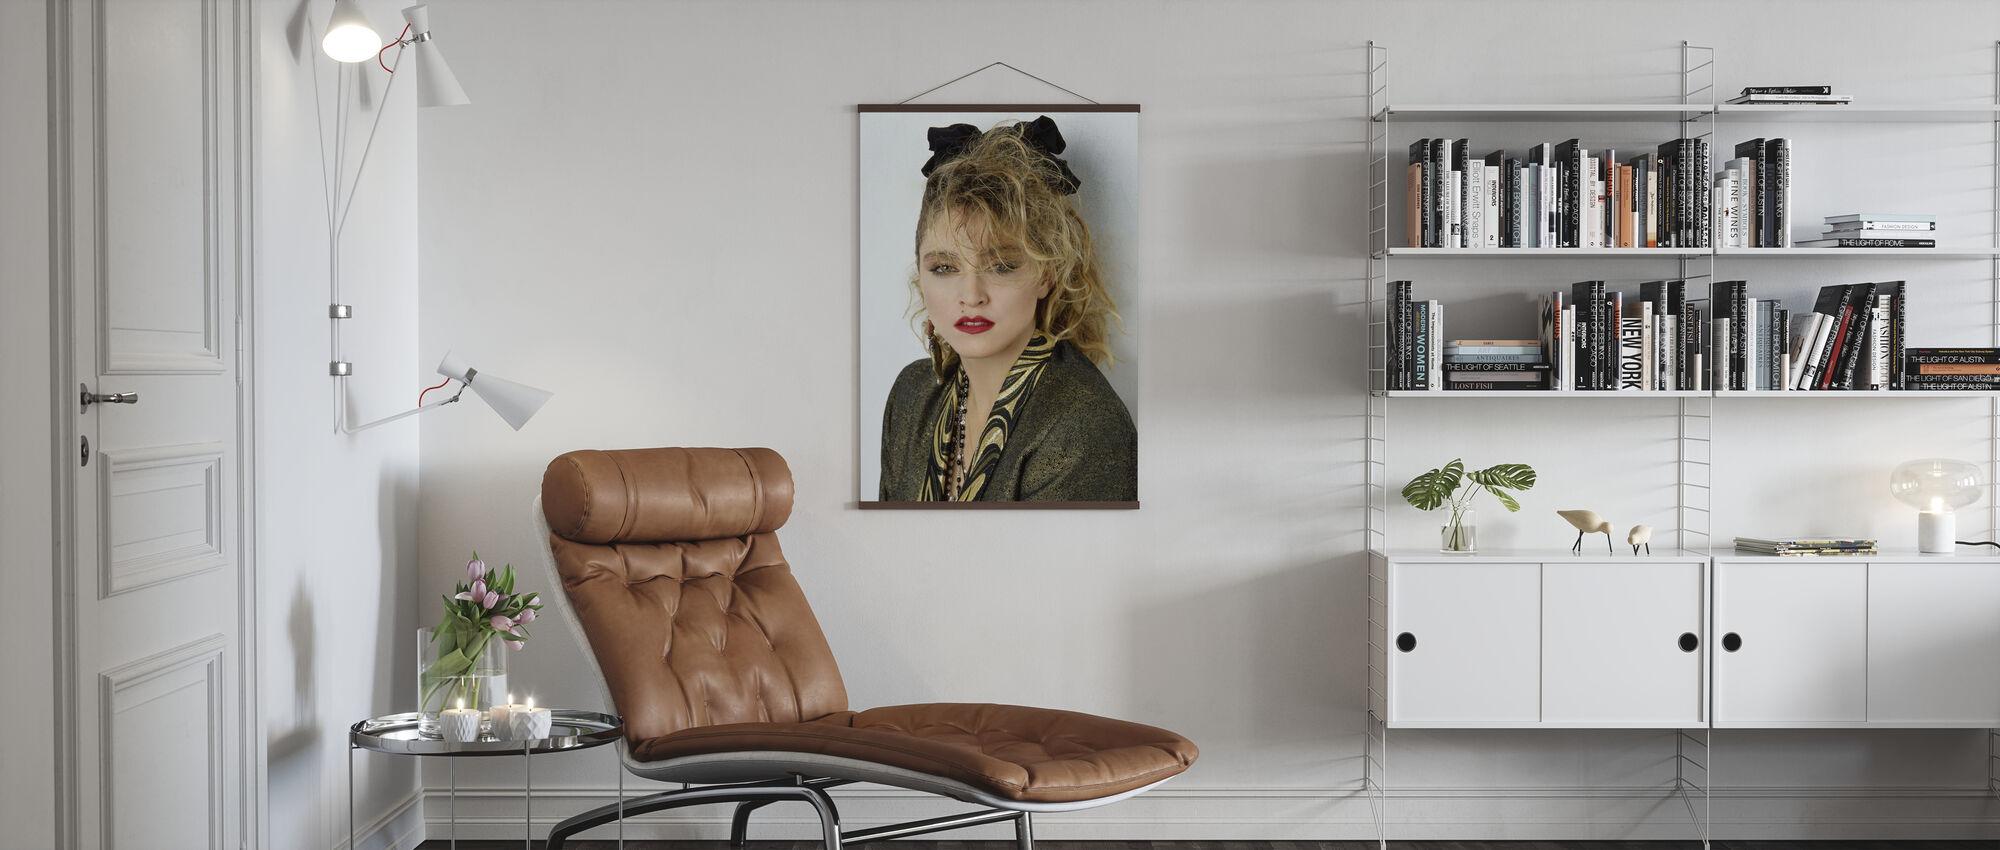 Madonna in Desperately Seeking Susan - Poster - Living Room